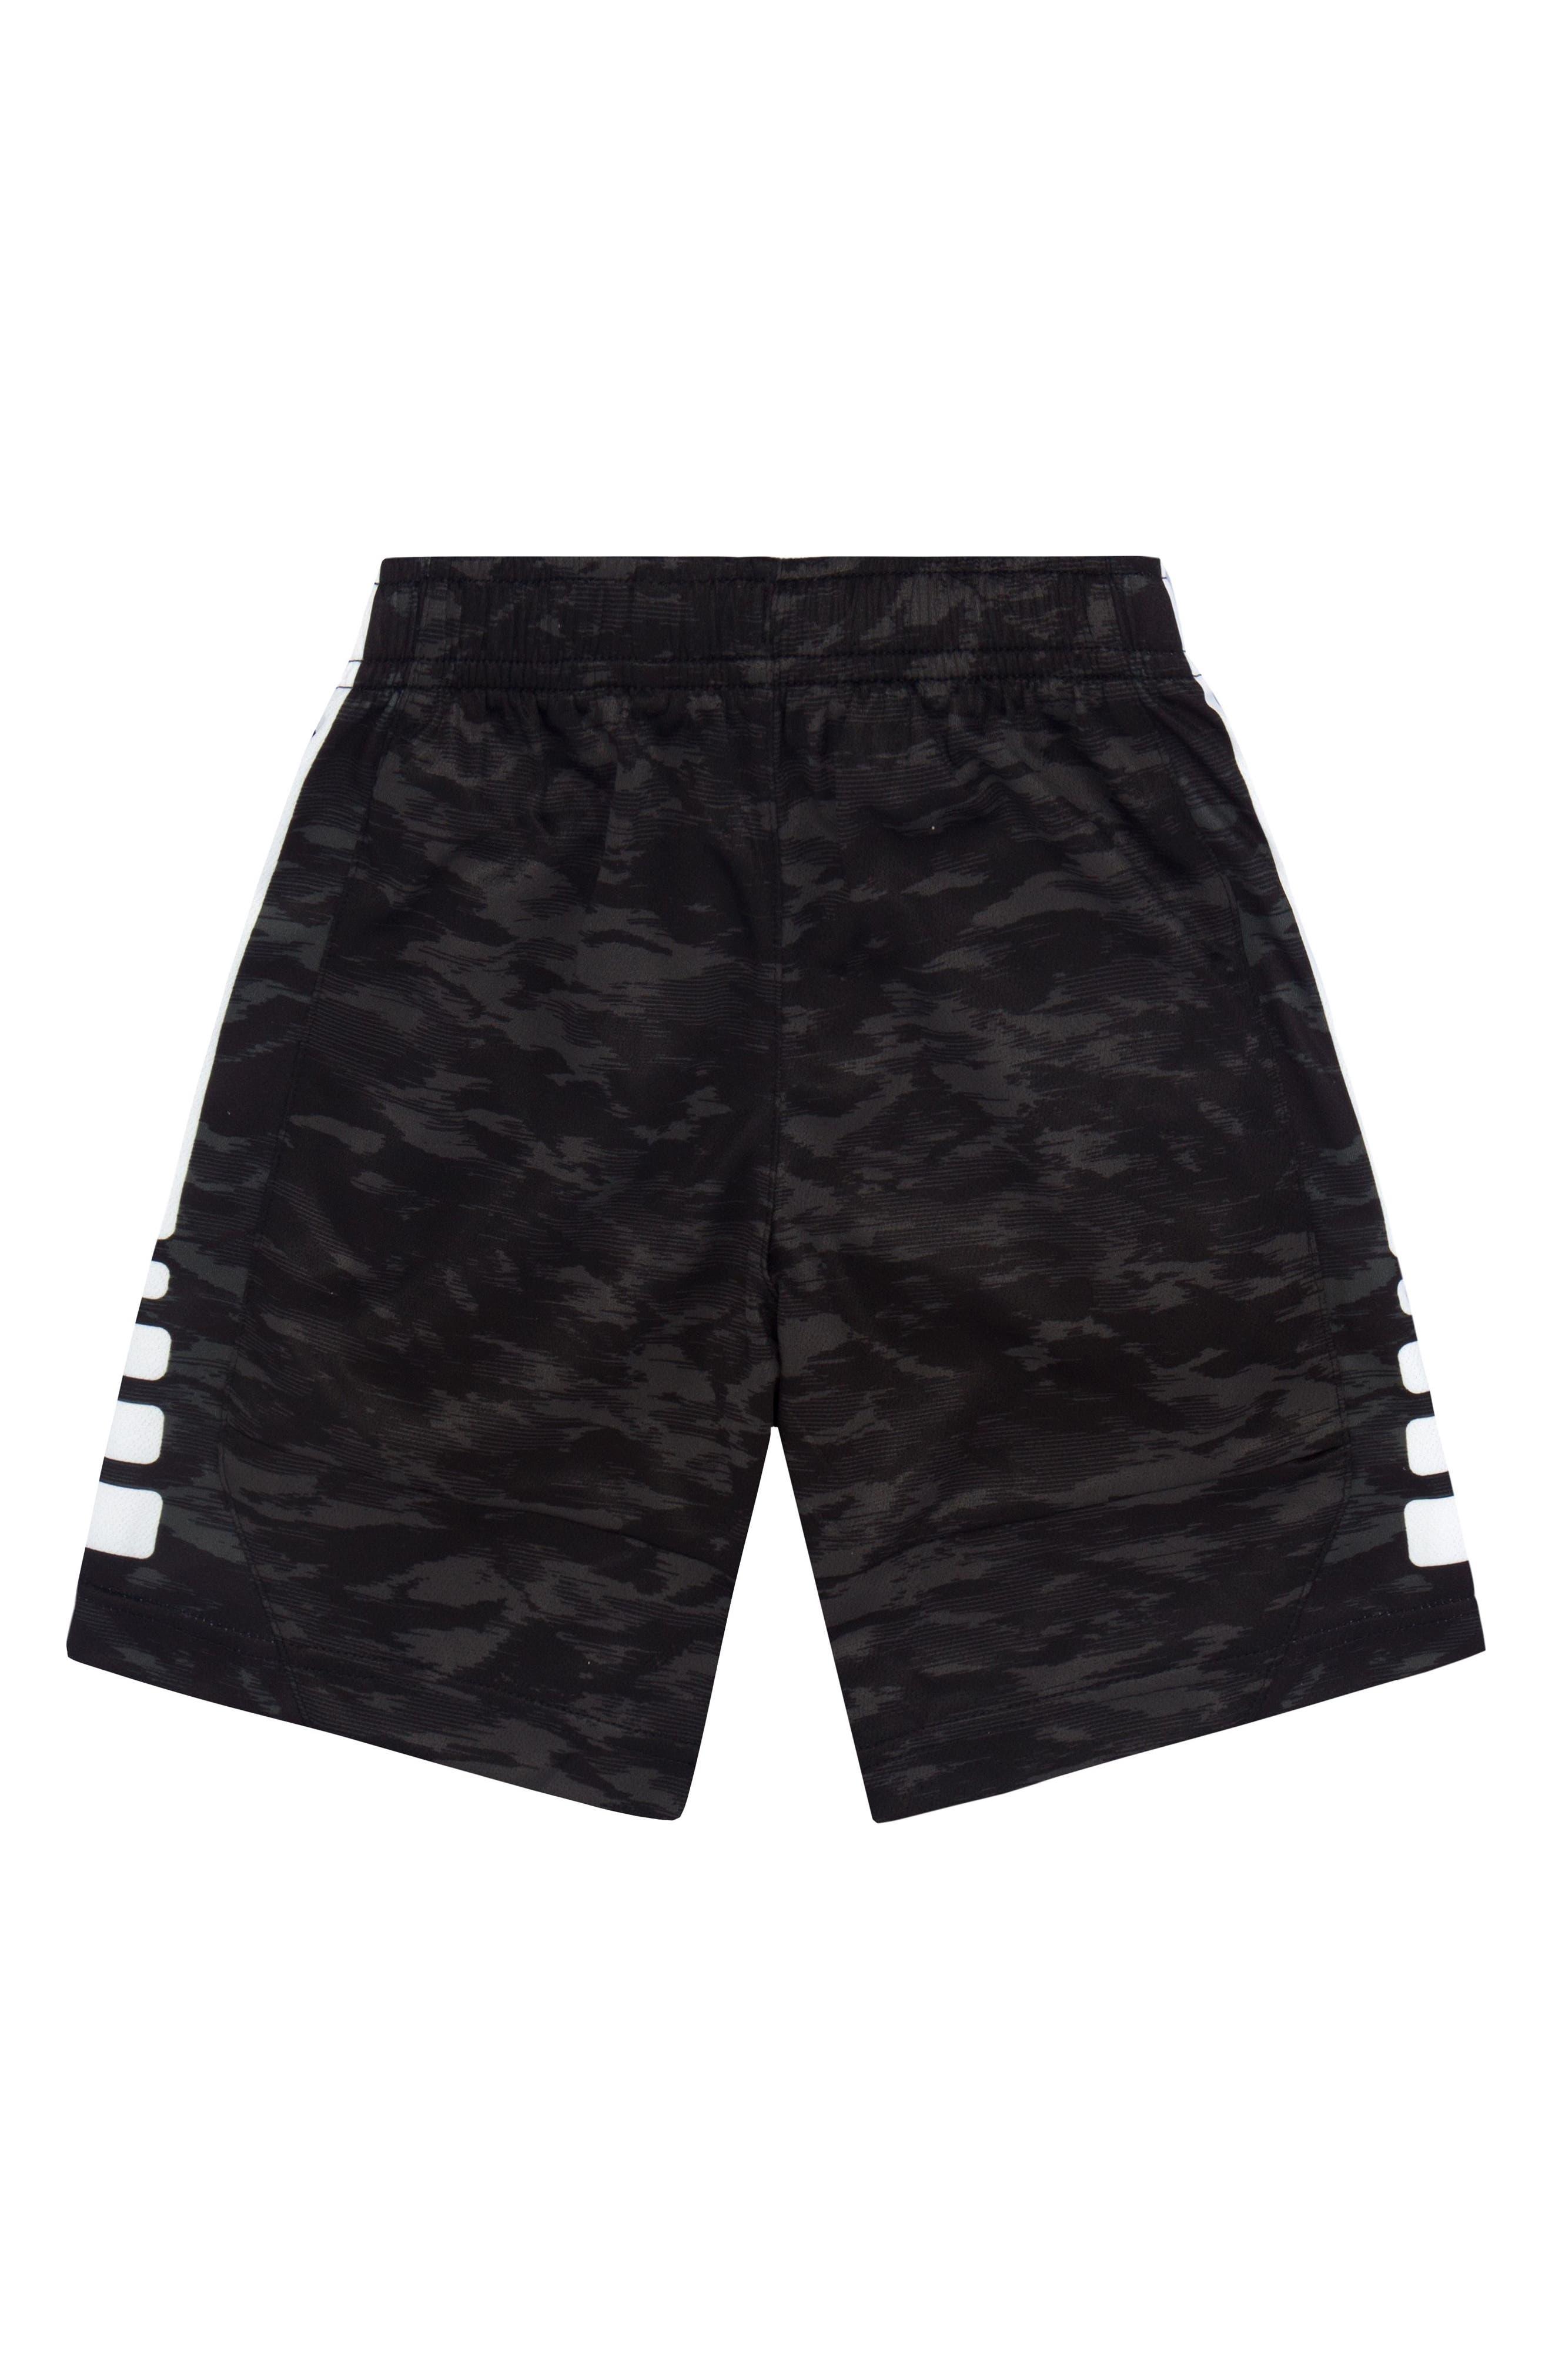 Alternate Image 2  - Nike Vent AOP Shorts (Toddler Boys & Little Boys)